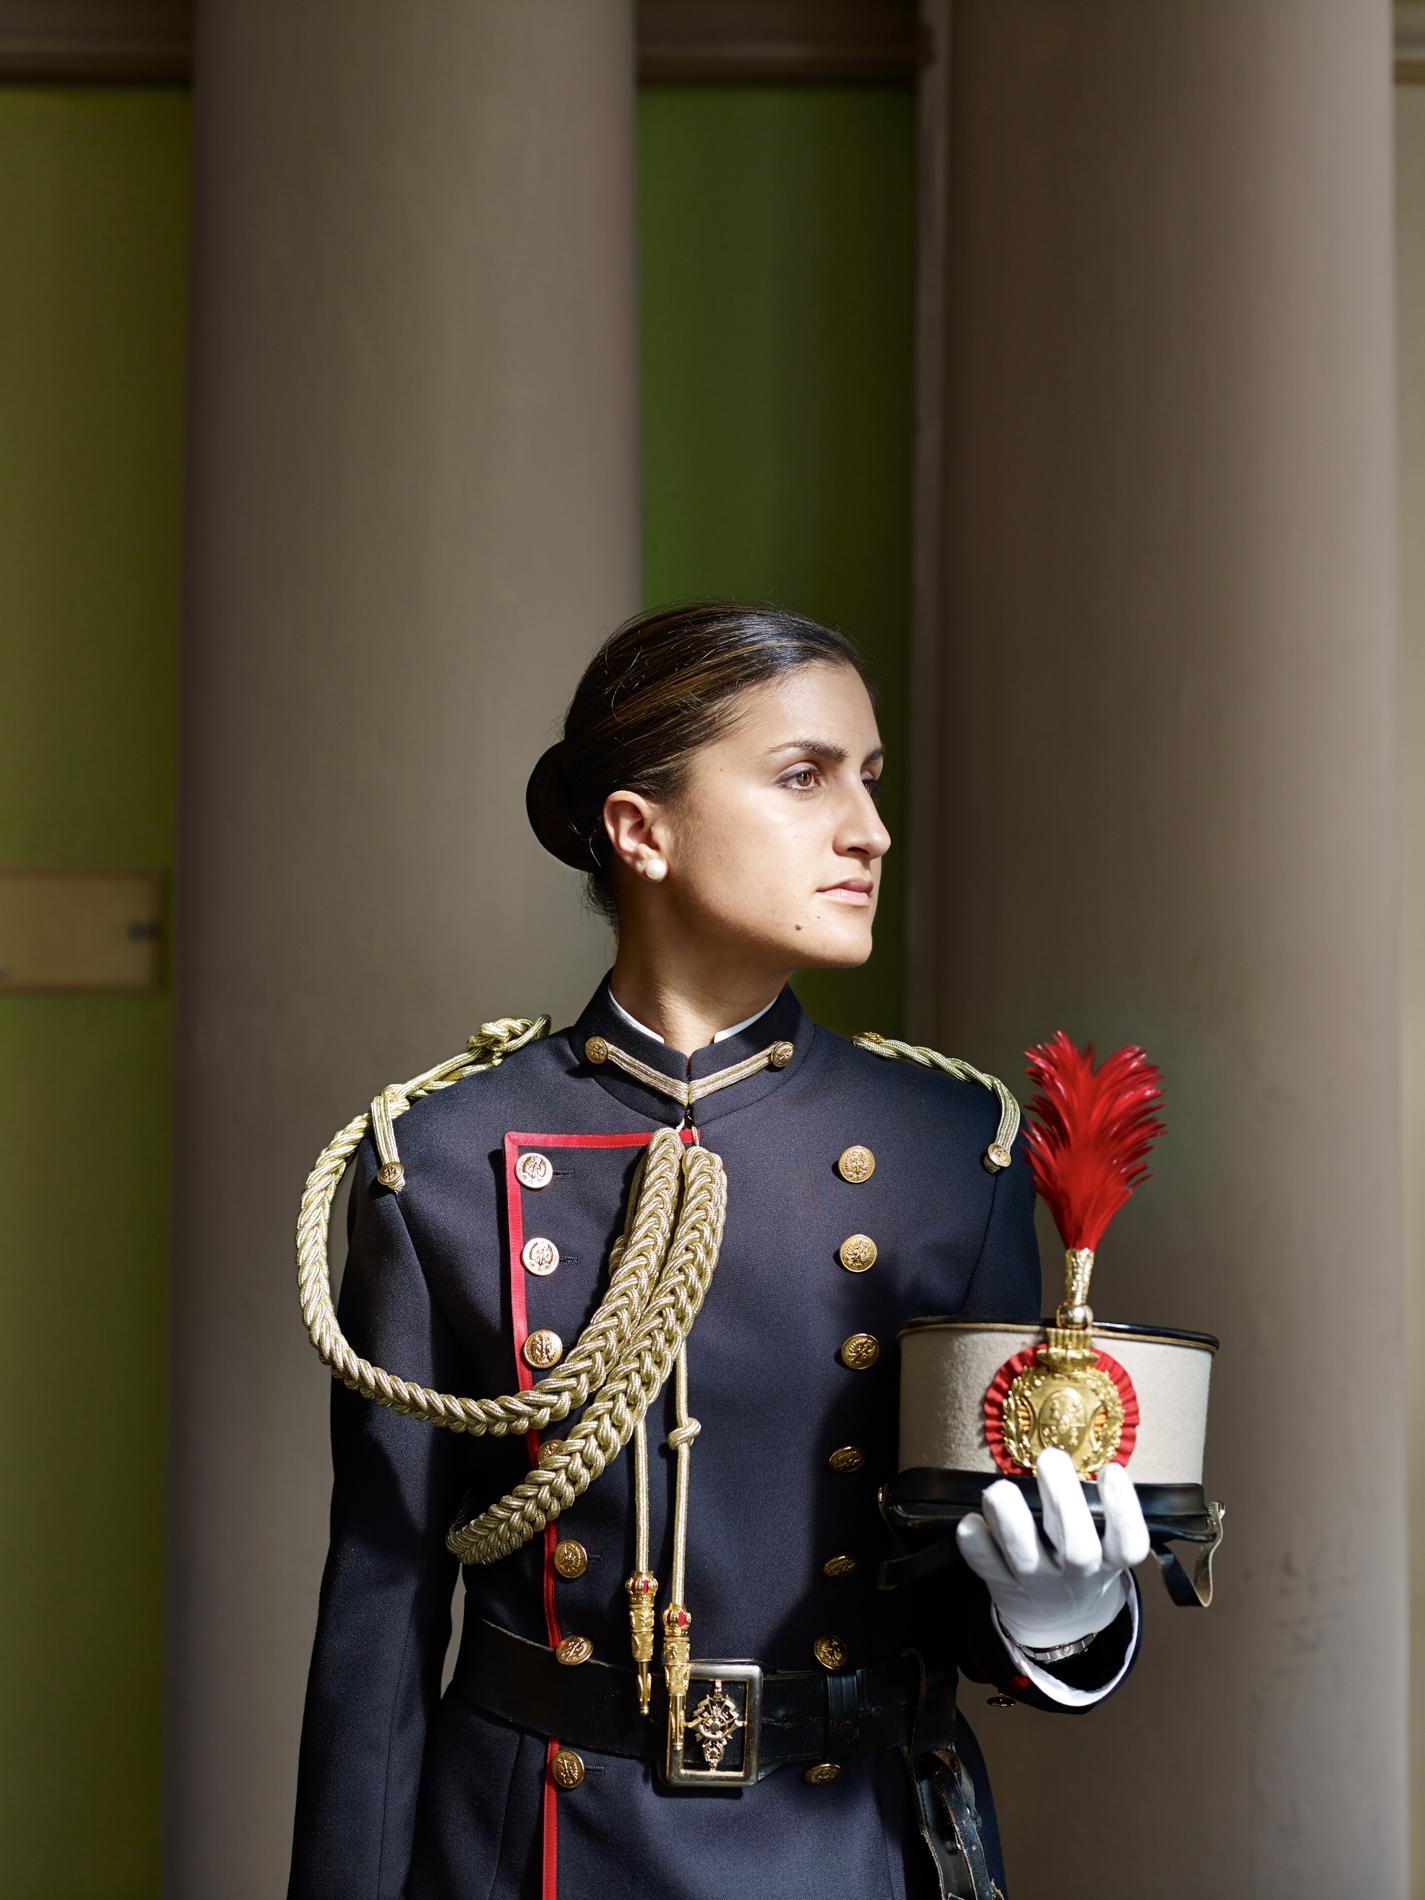 ACADEMIA GENERAL MILITAR ZARAGOZA SPAIN